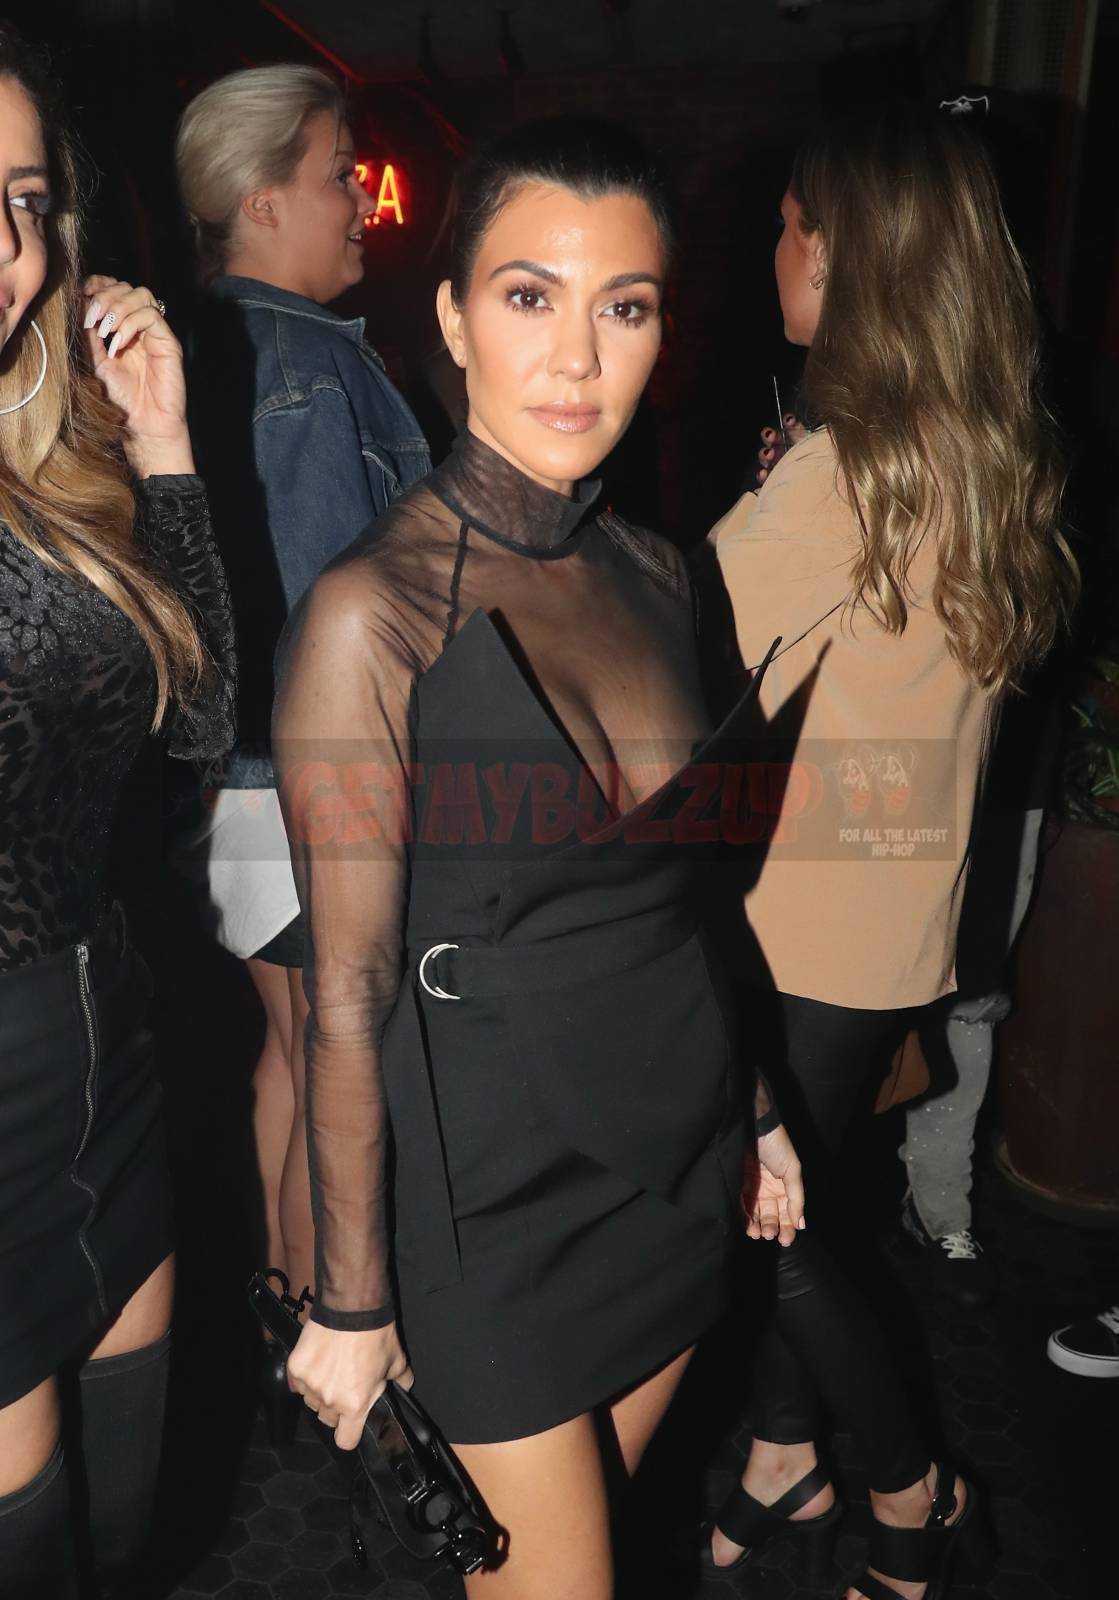 Kourtney Kardashian, Odell Beckham Jr., Pharrell Williams attend LIV on Sunday [Photos]